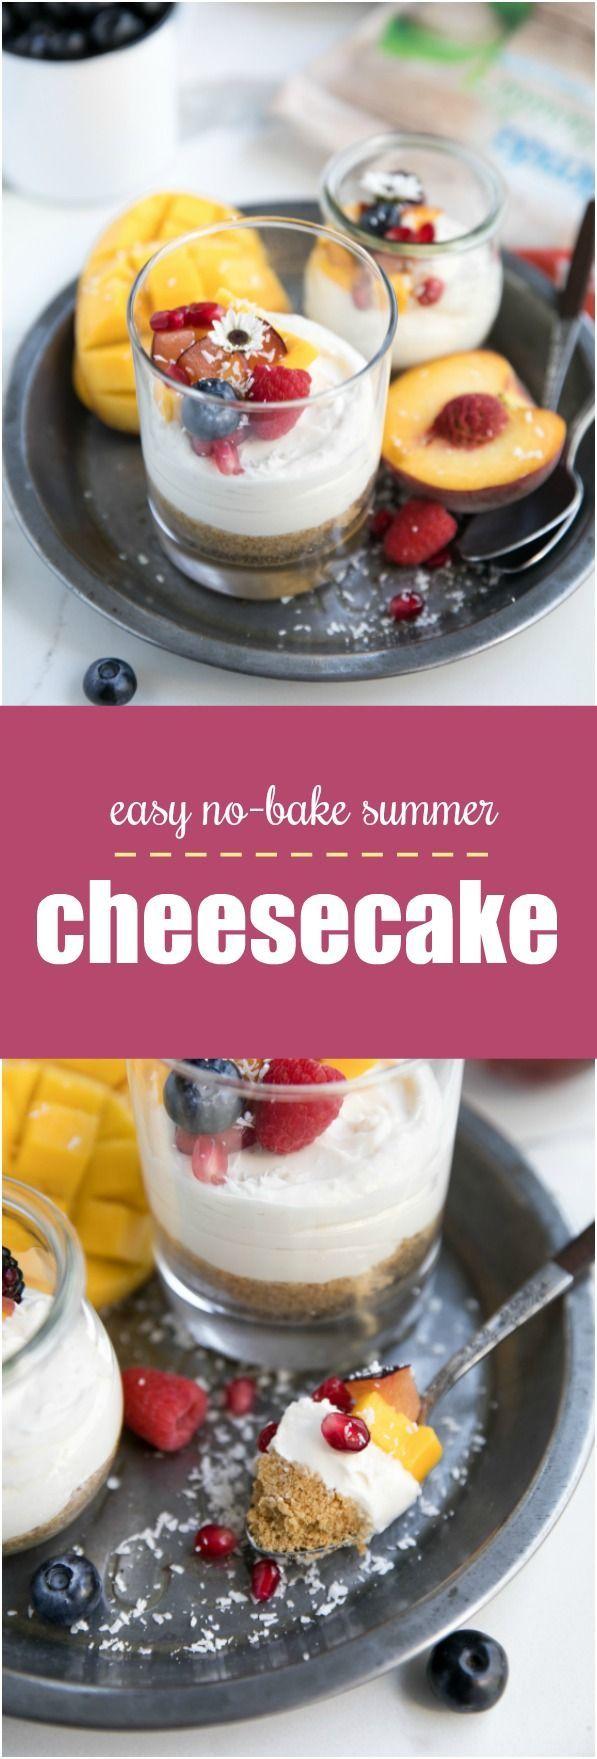 Easy No-Bake Summer Cheesecake with Less Added Sugar #SplendaSweeties #SweetSwaps #sponsored @splenda